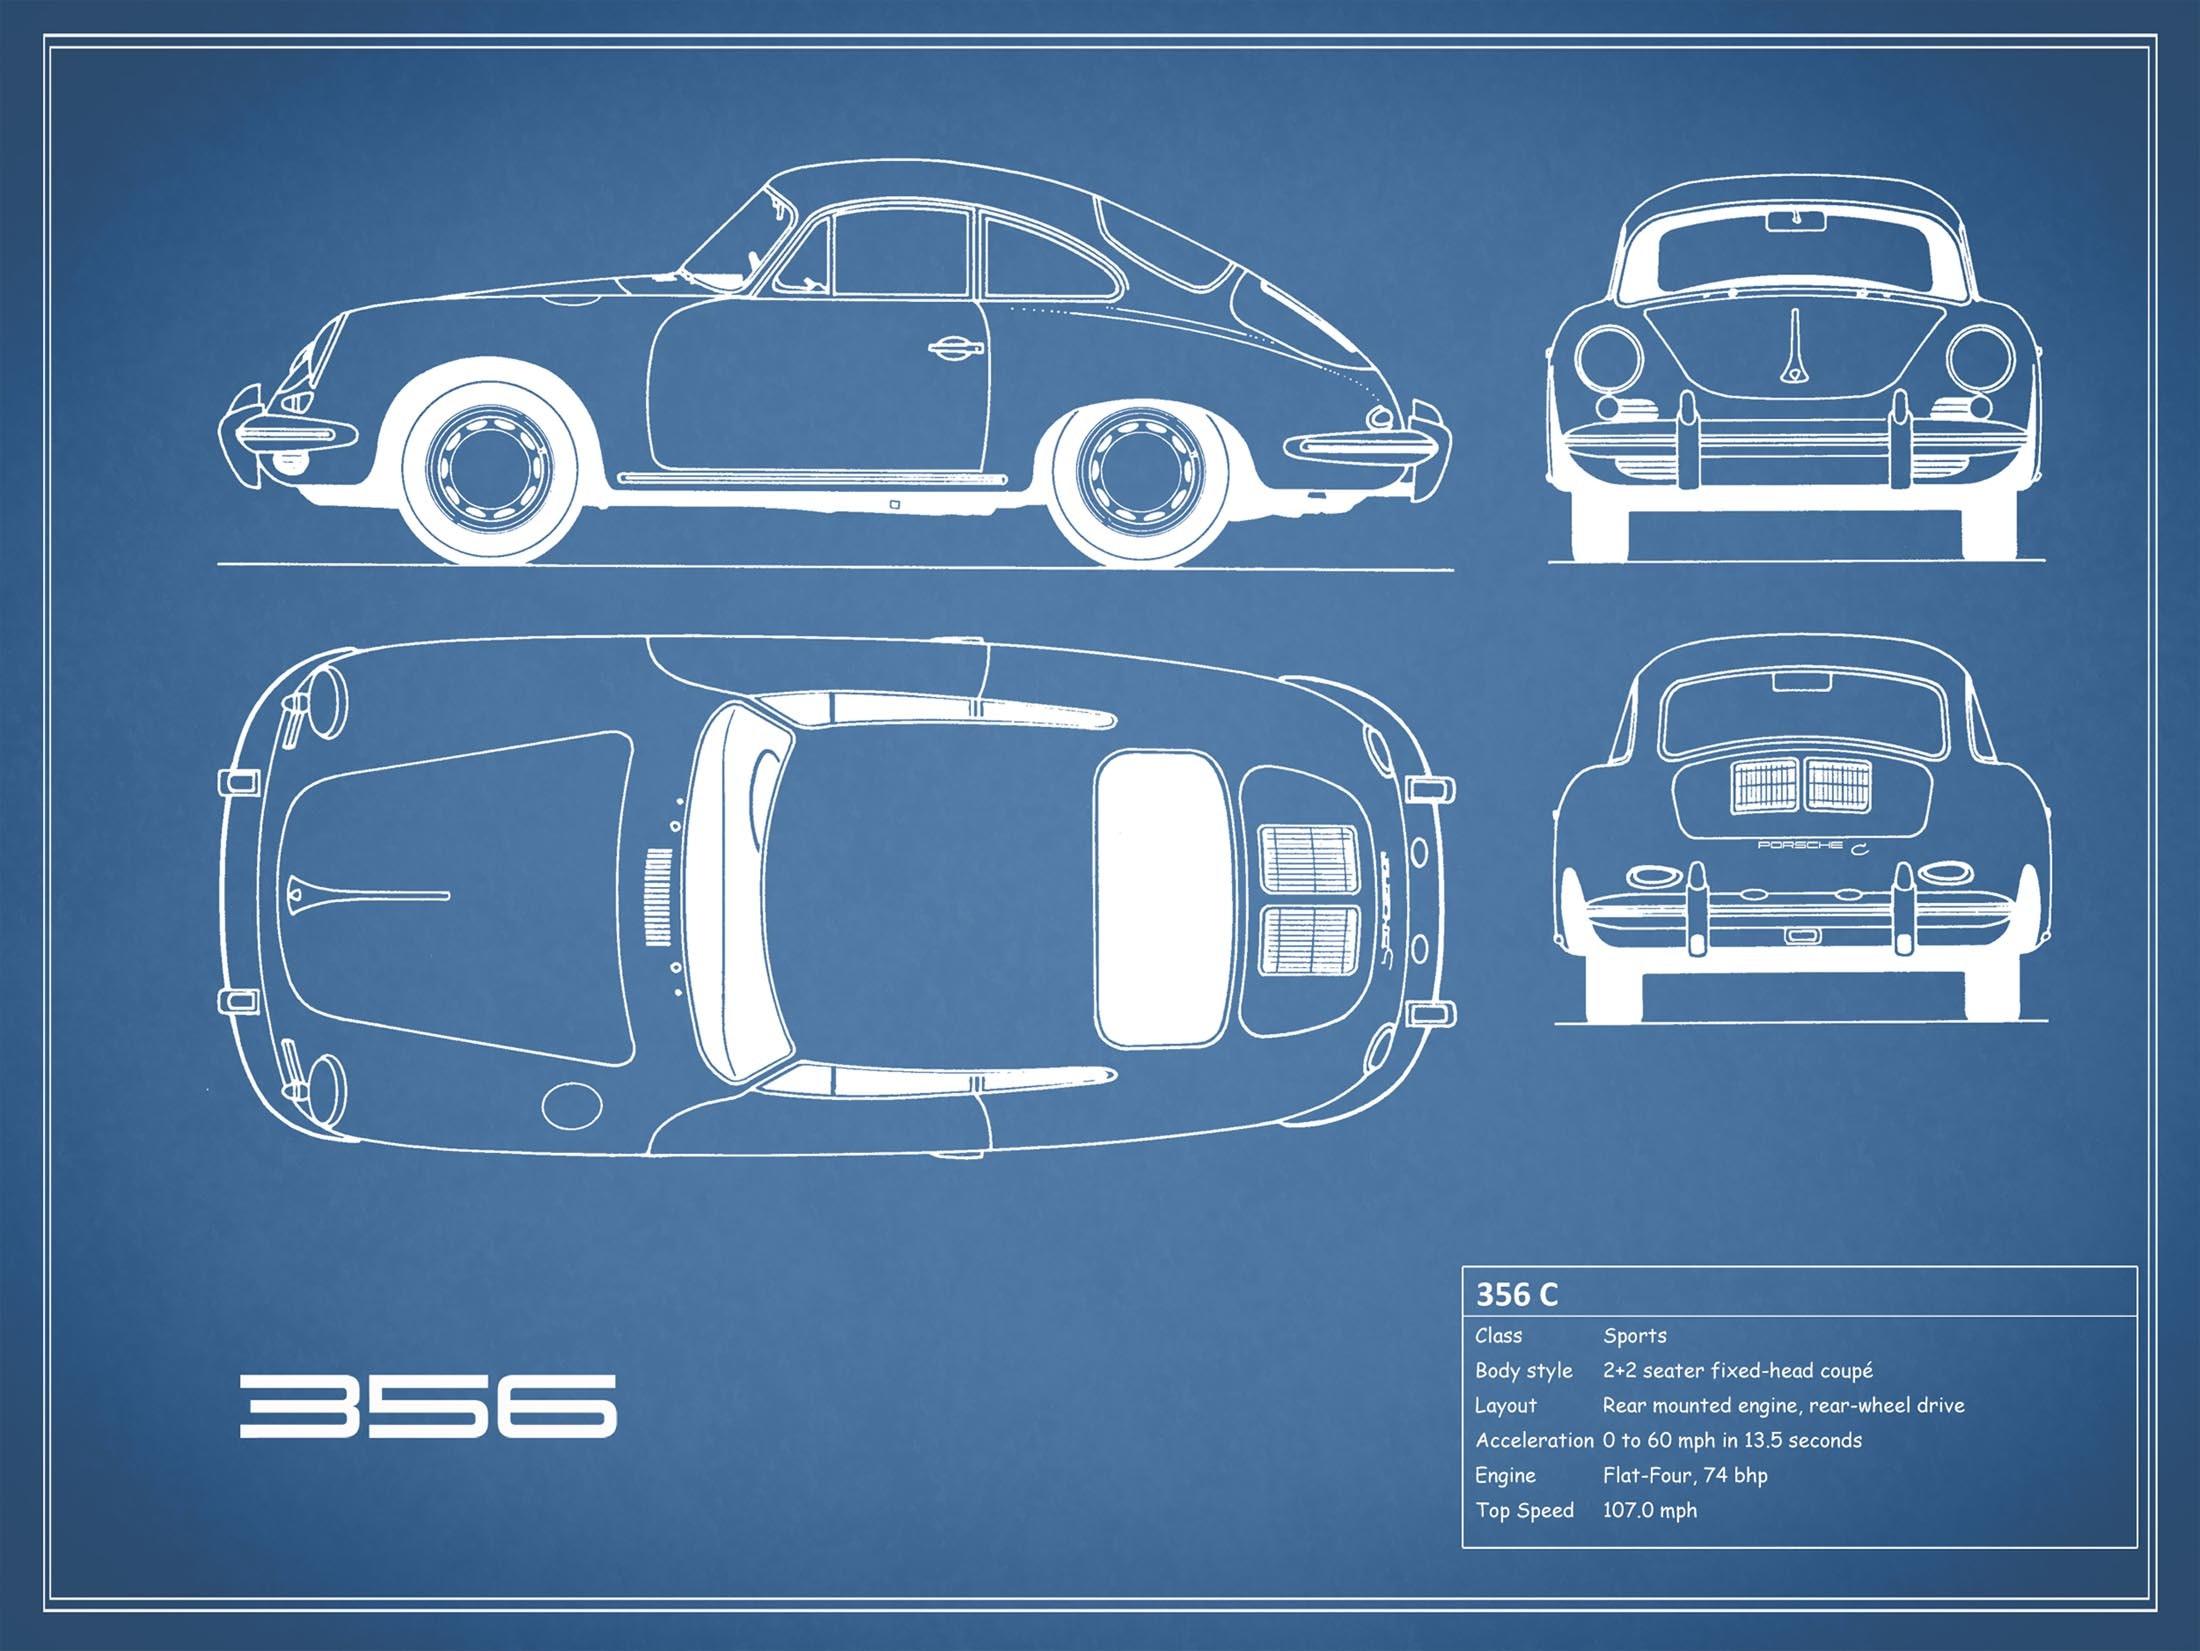 Porsche 356 C - Blue